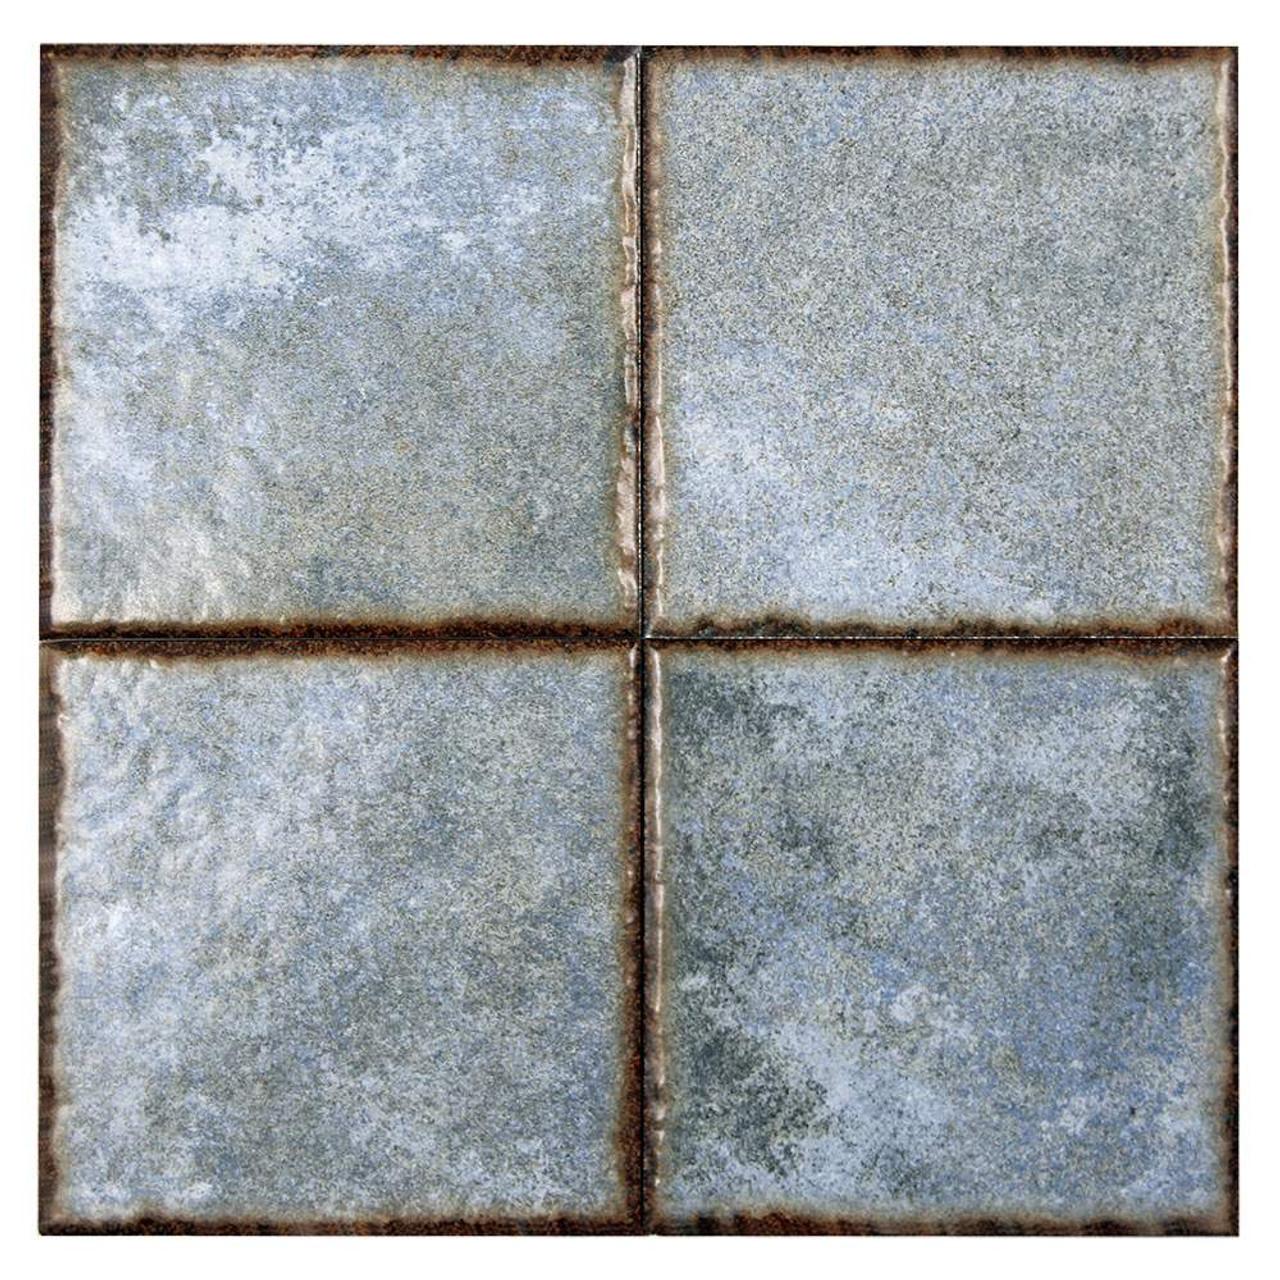 Benisa Blue Porcelain 6x6 Pool Grade Tile